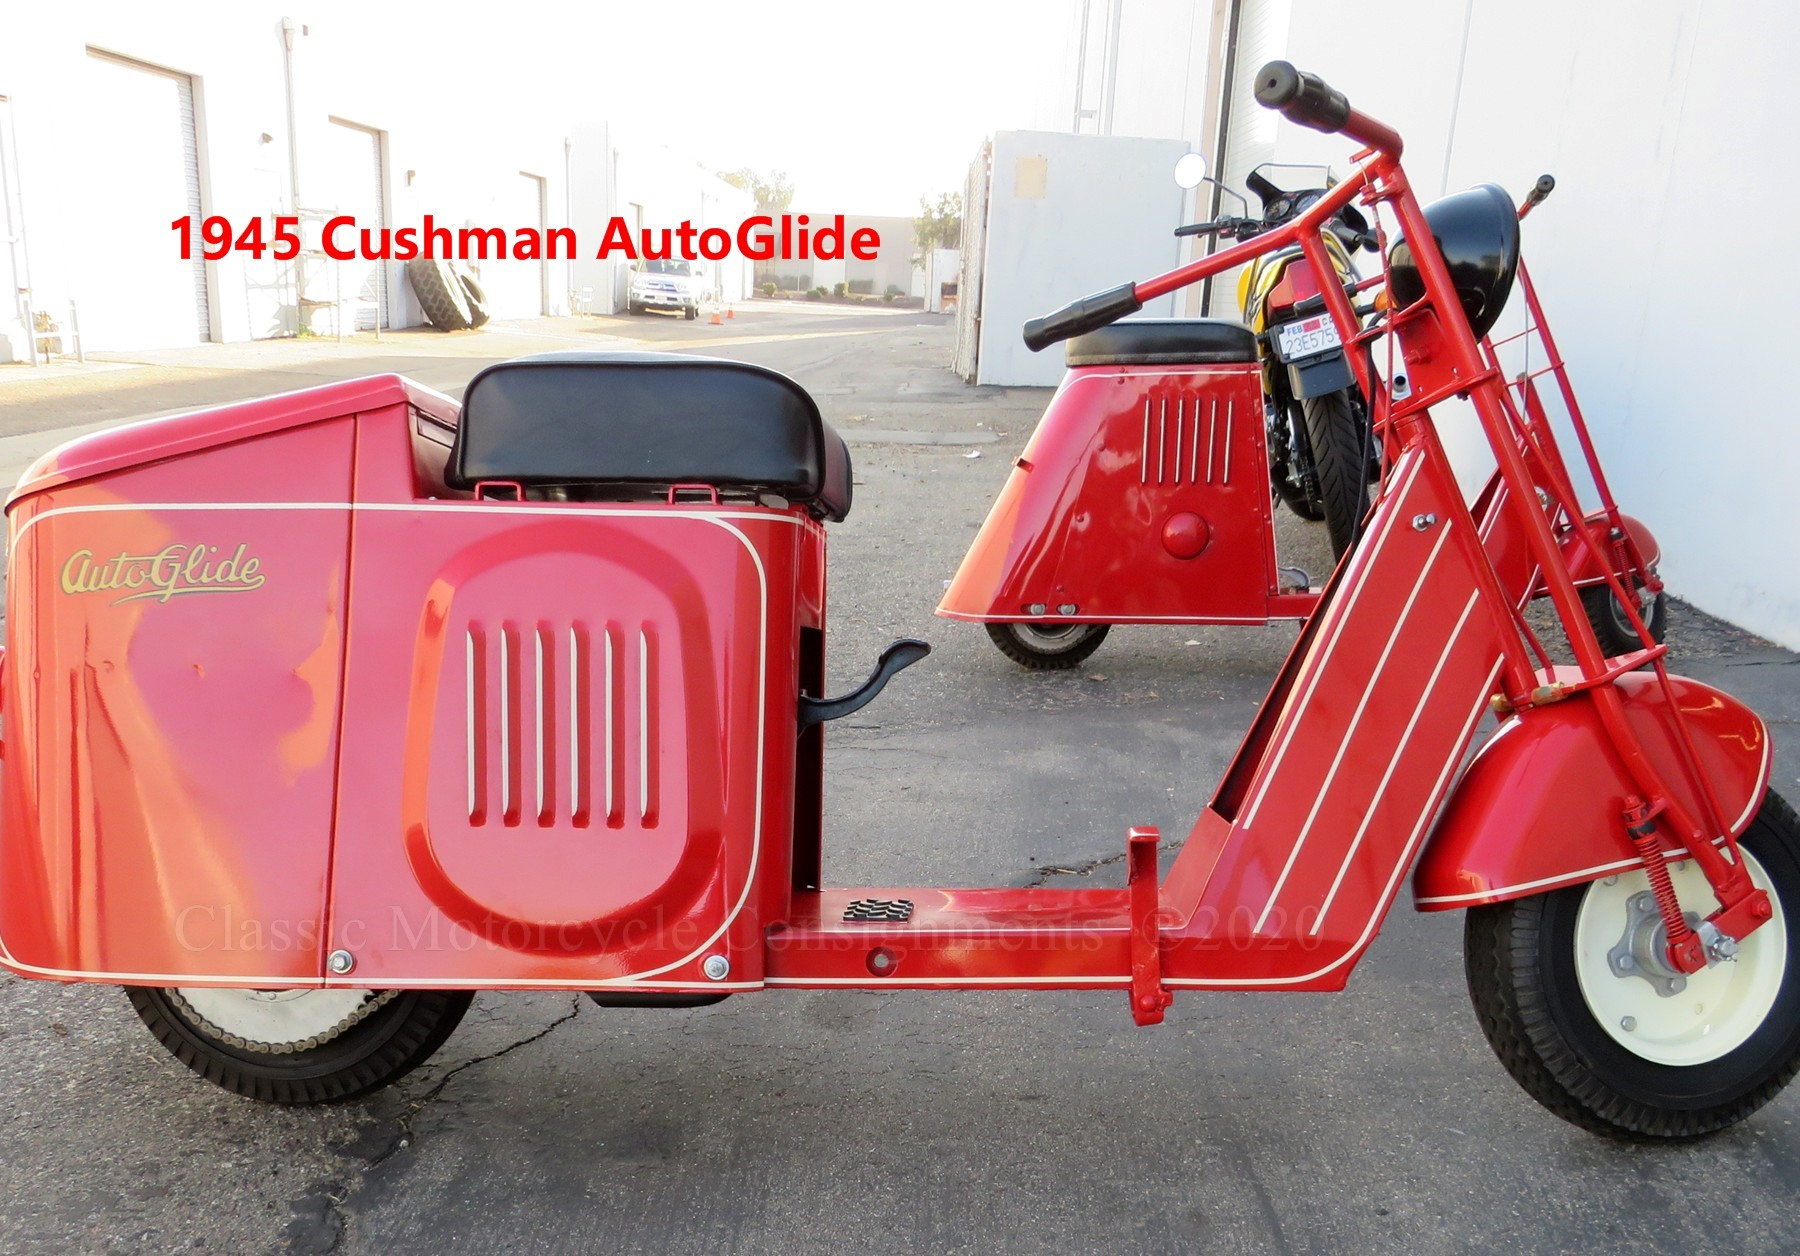 1945 Cushman AutoGlide Scooter